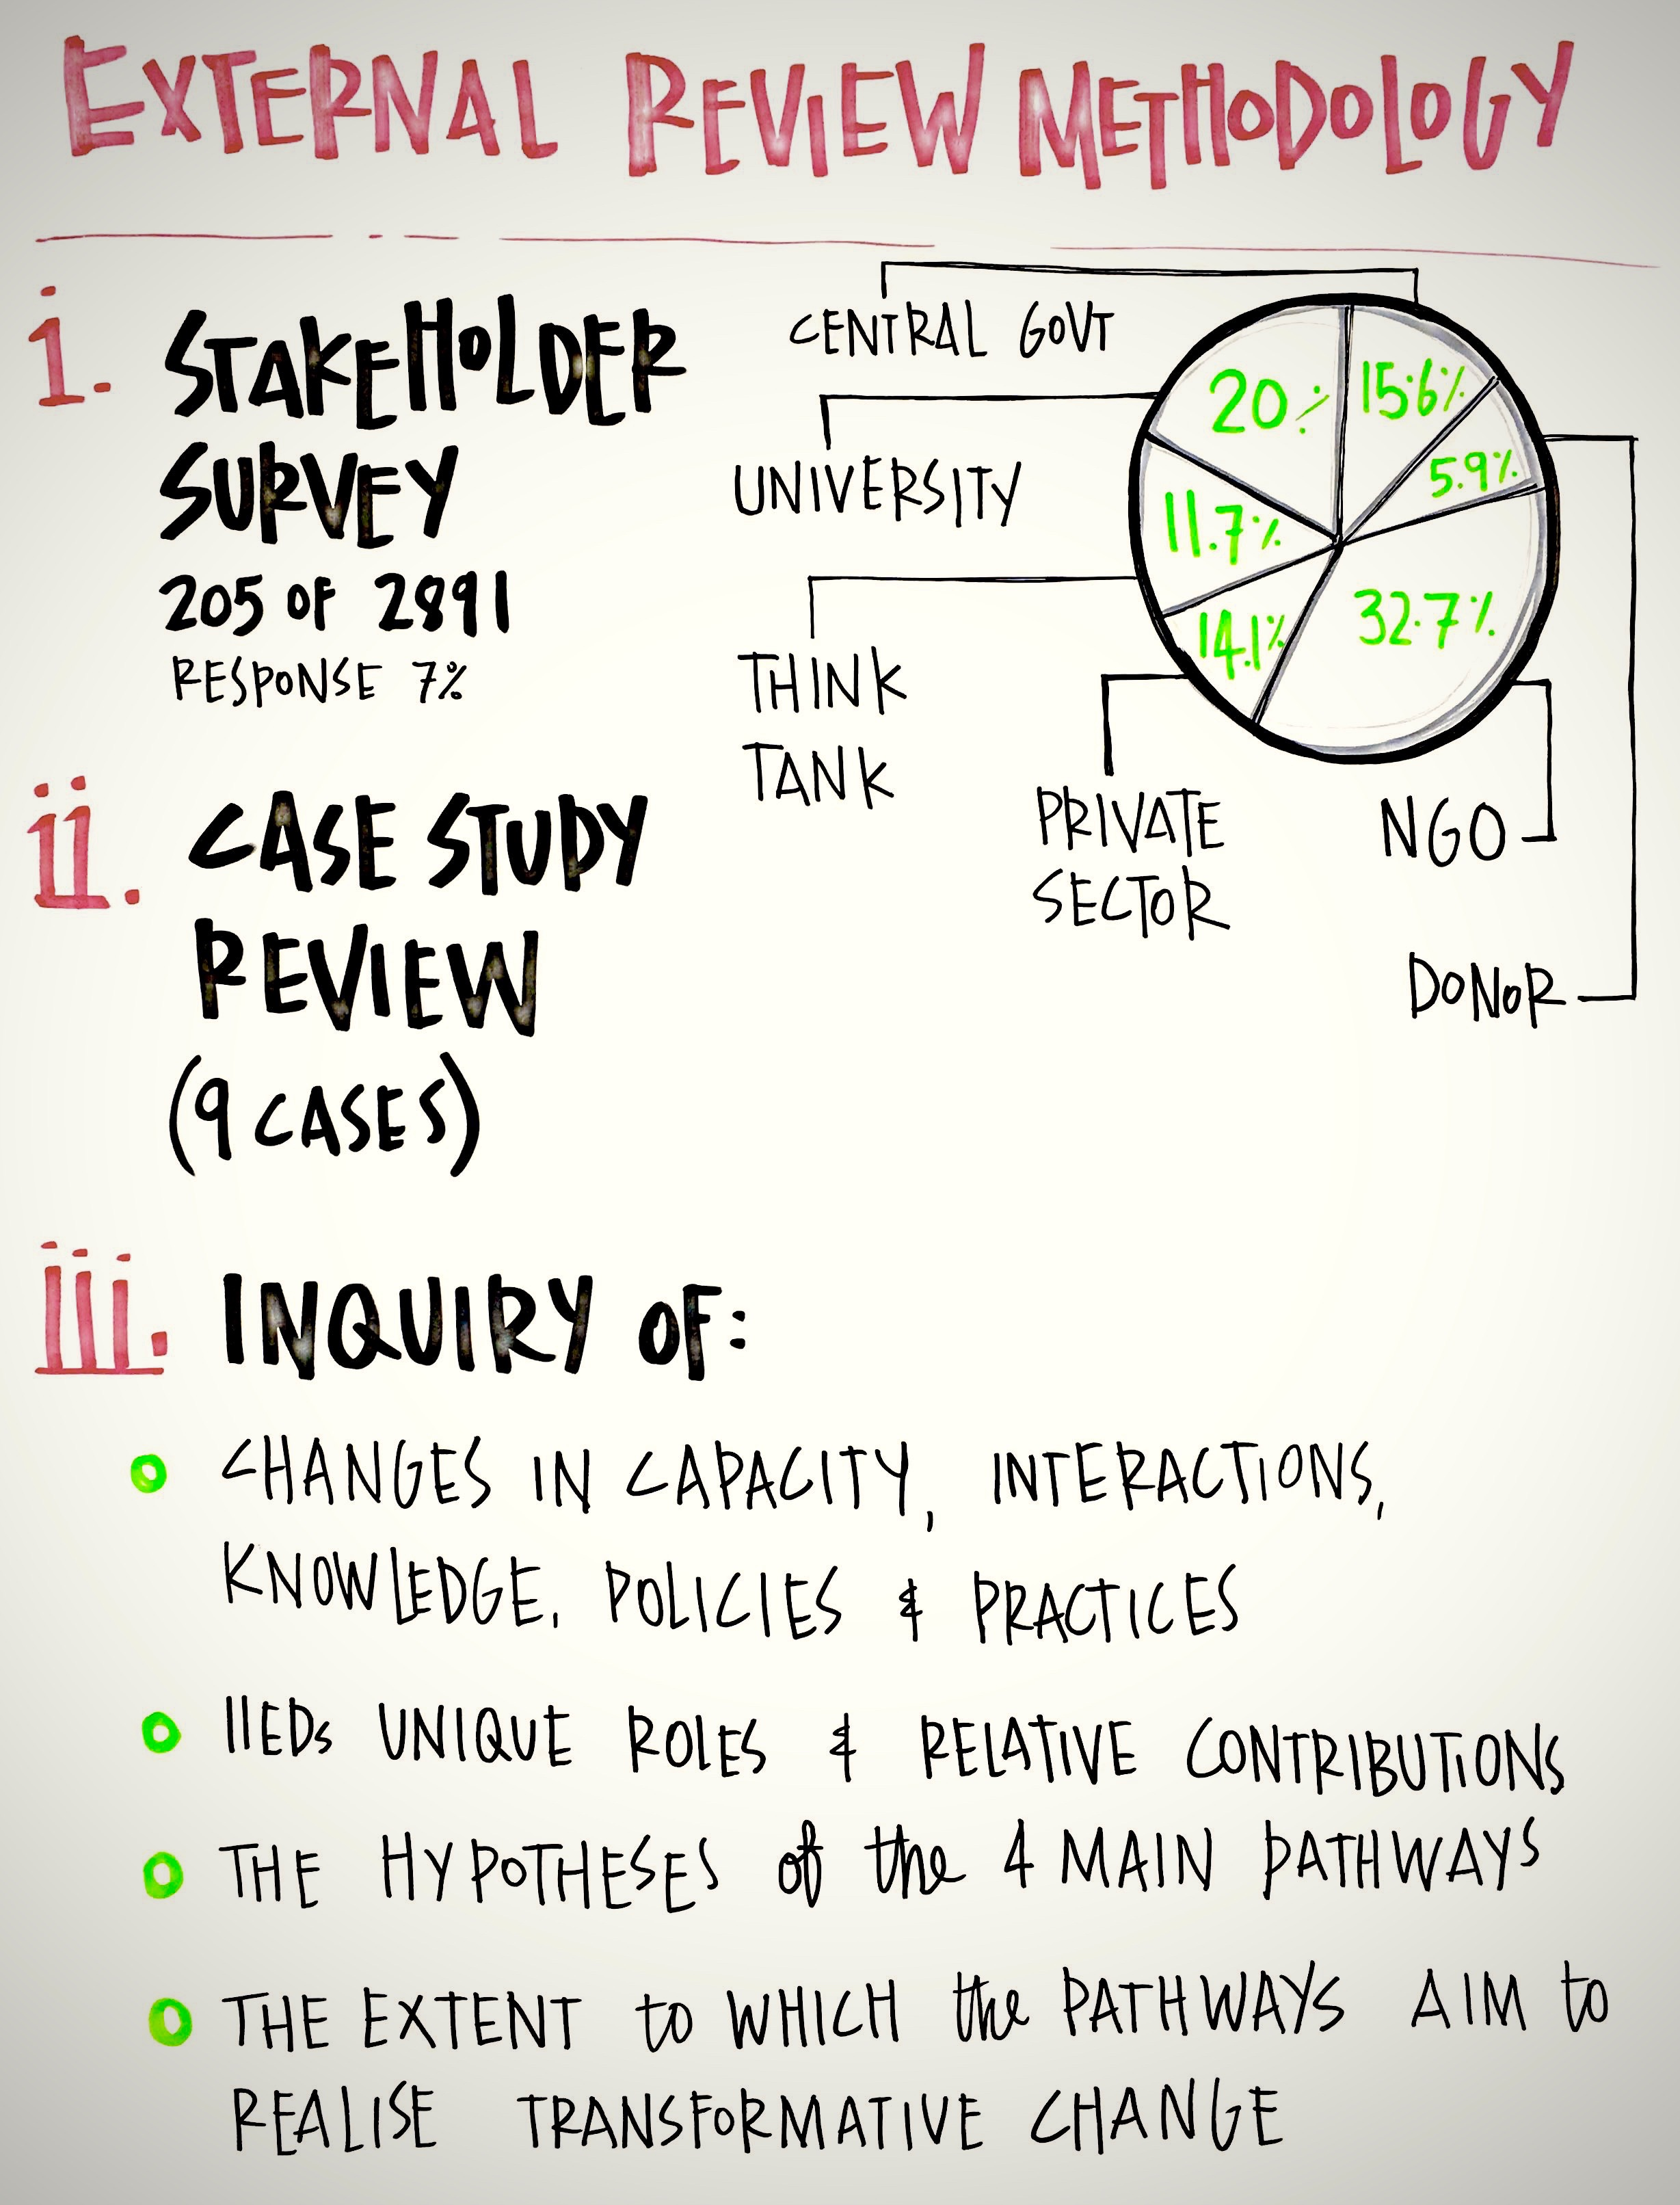 External Review Methodology.jpg